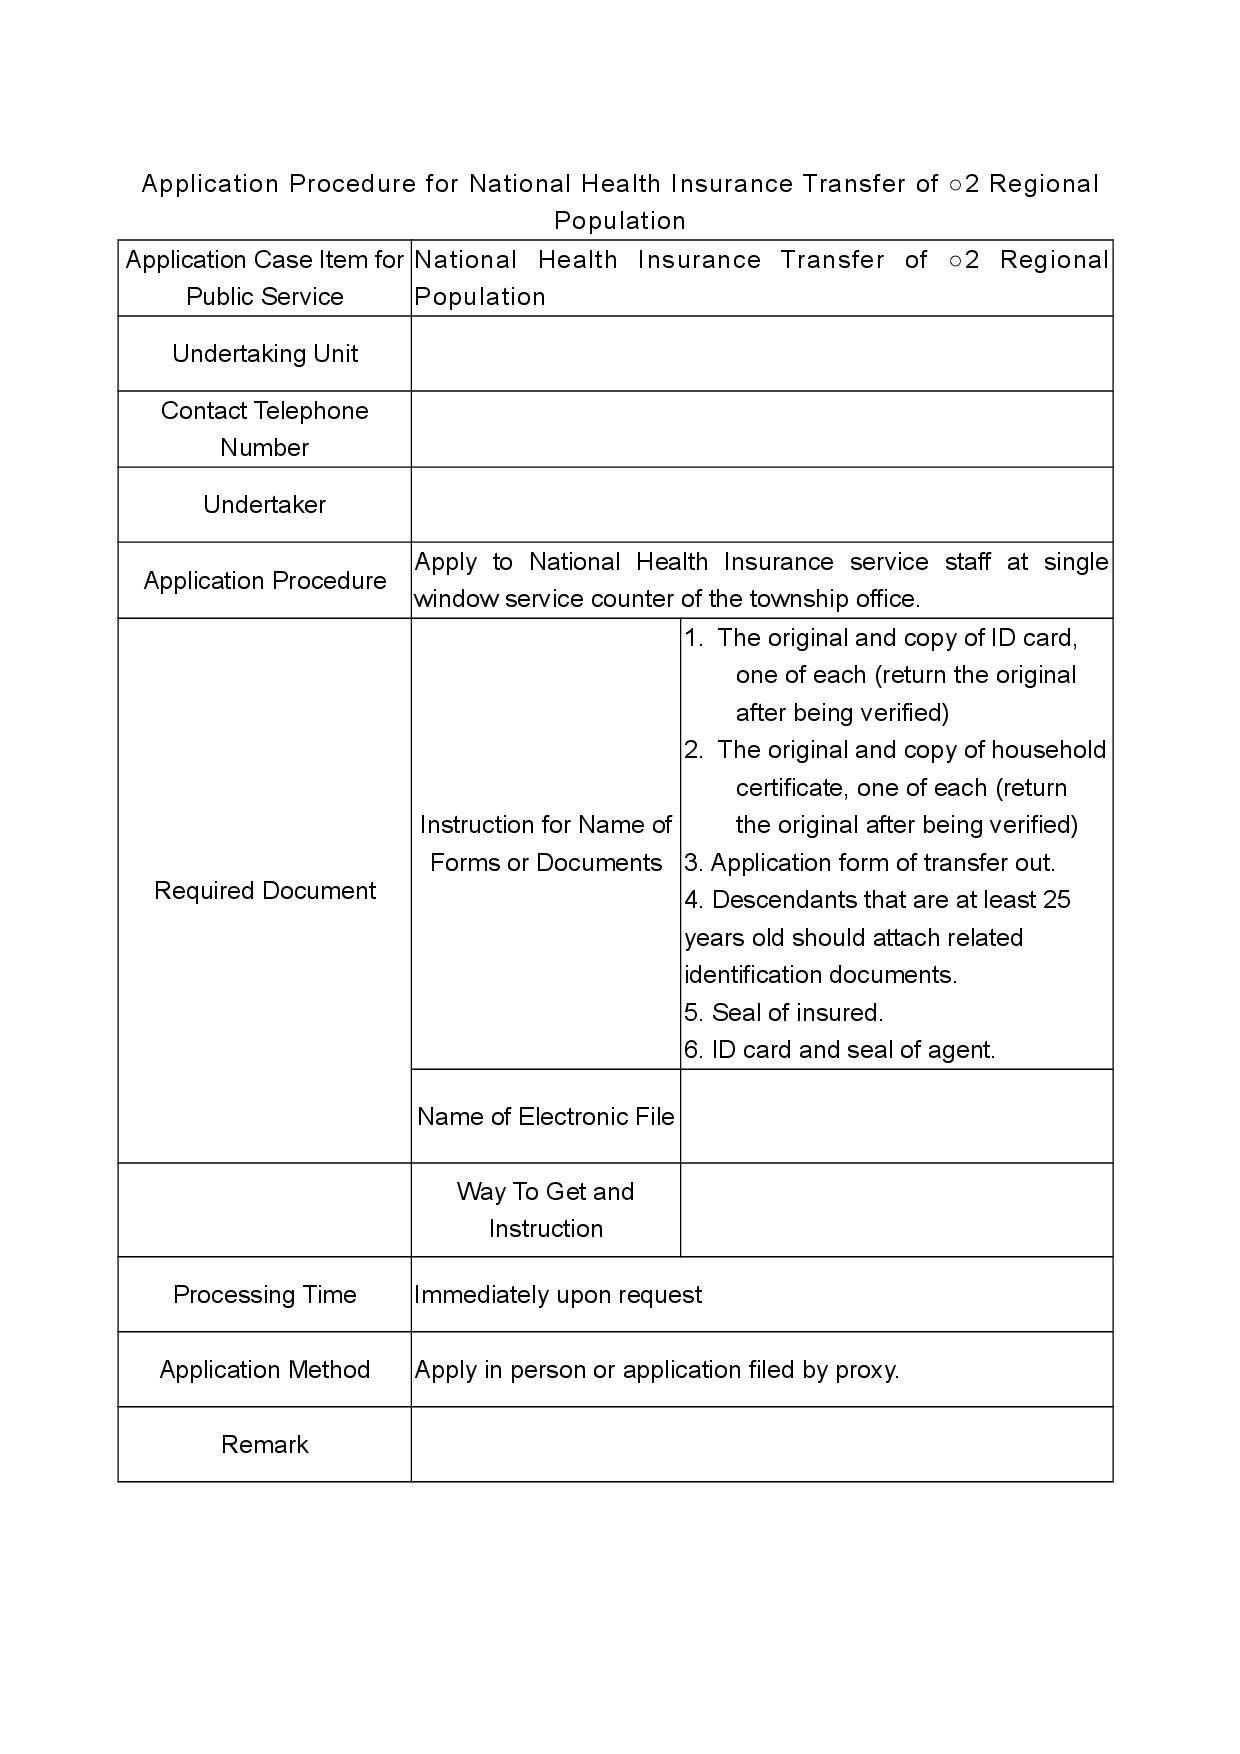 Application Procedure for National Health Insurance Transfer of ○2 Regional Population